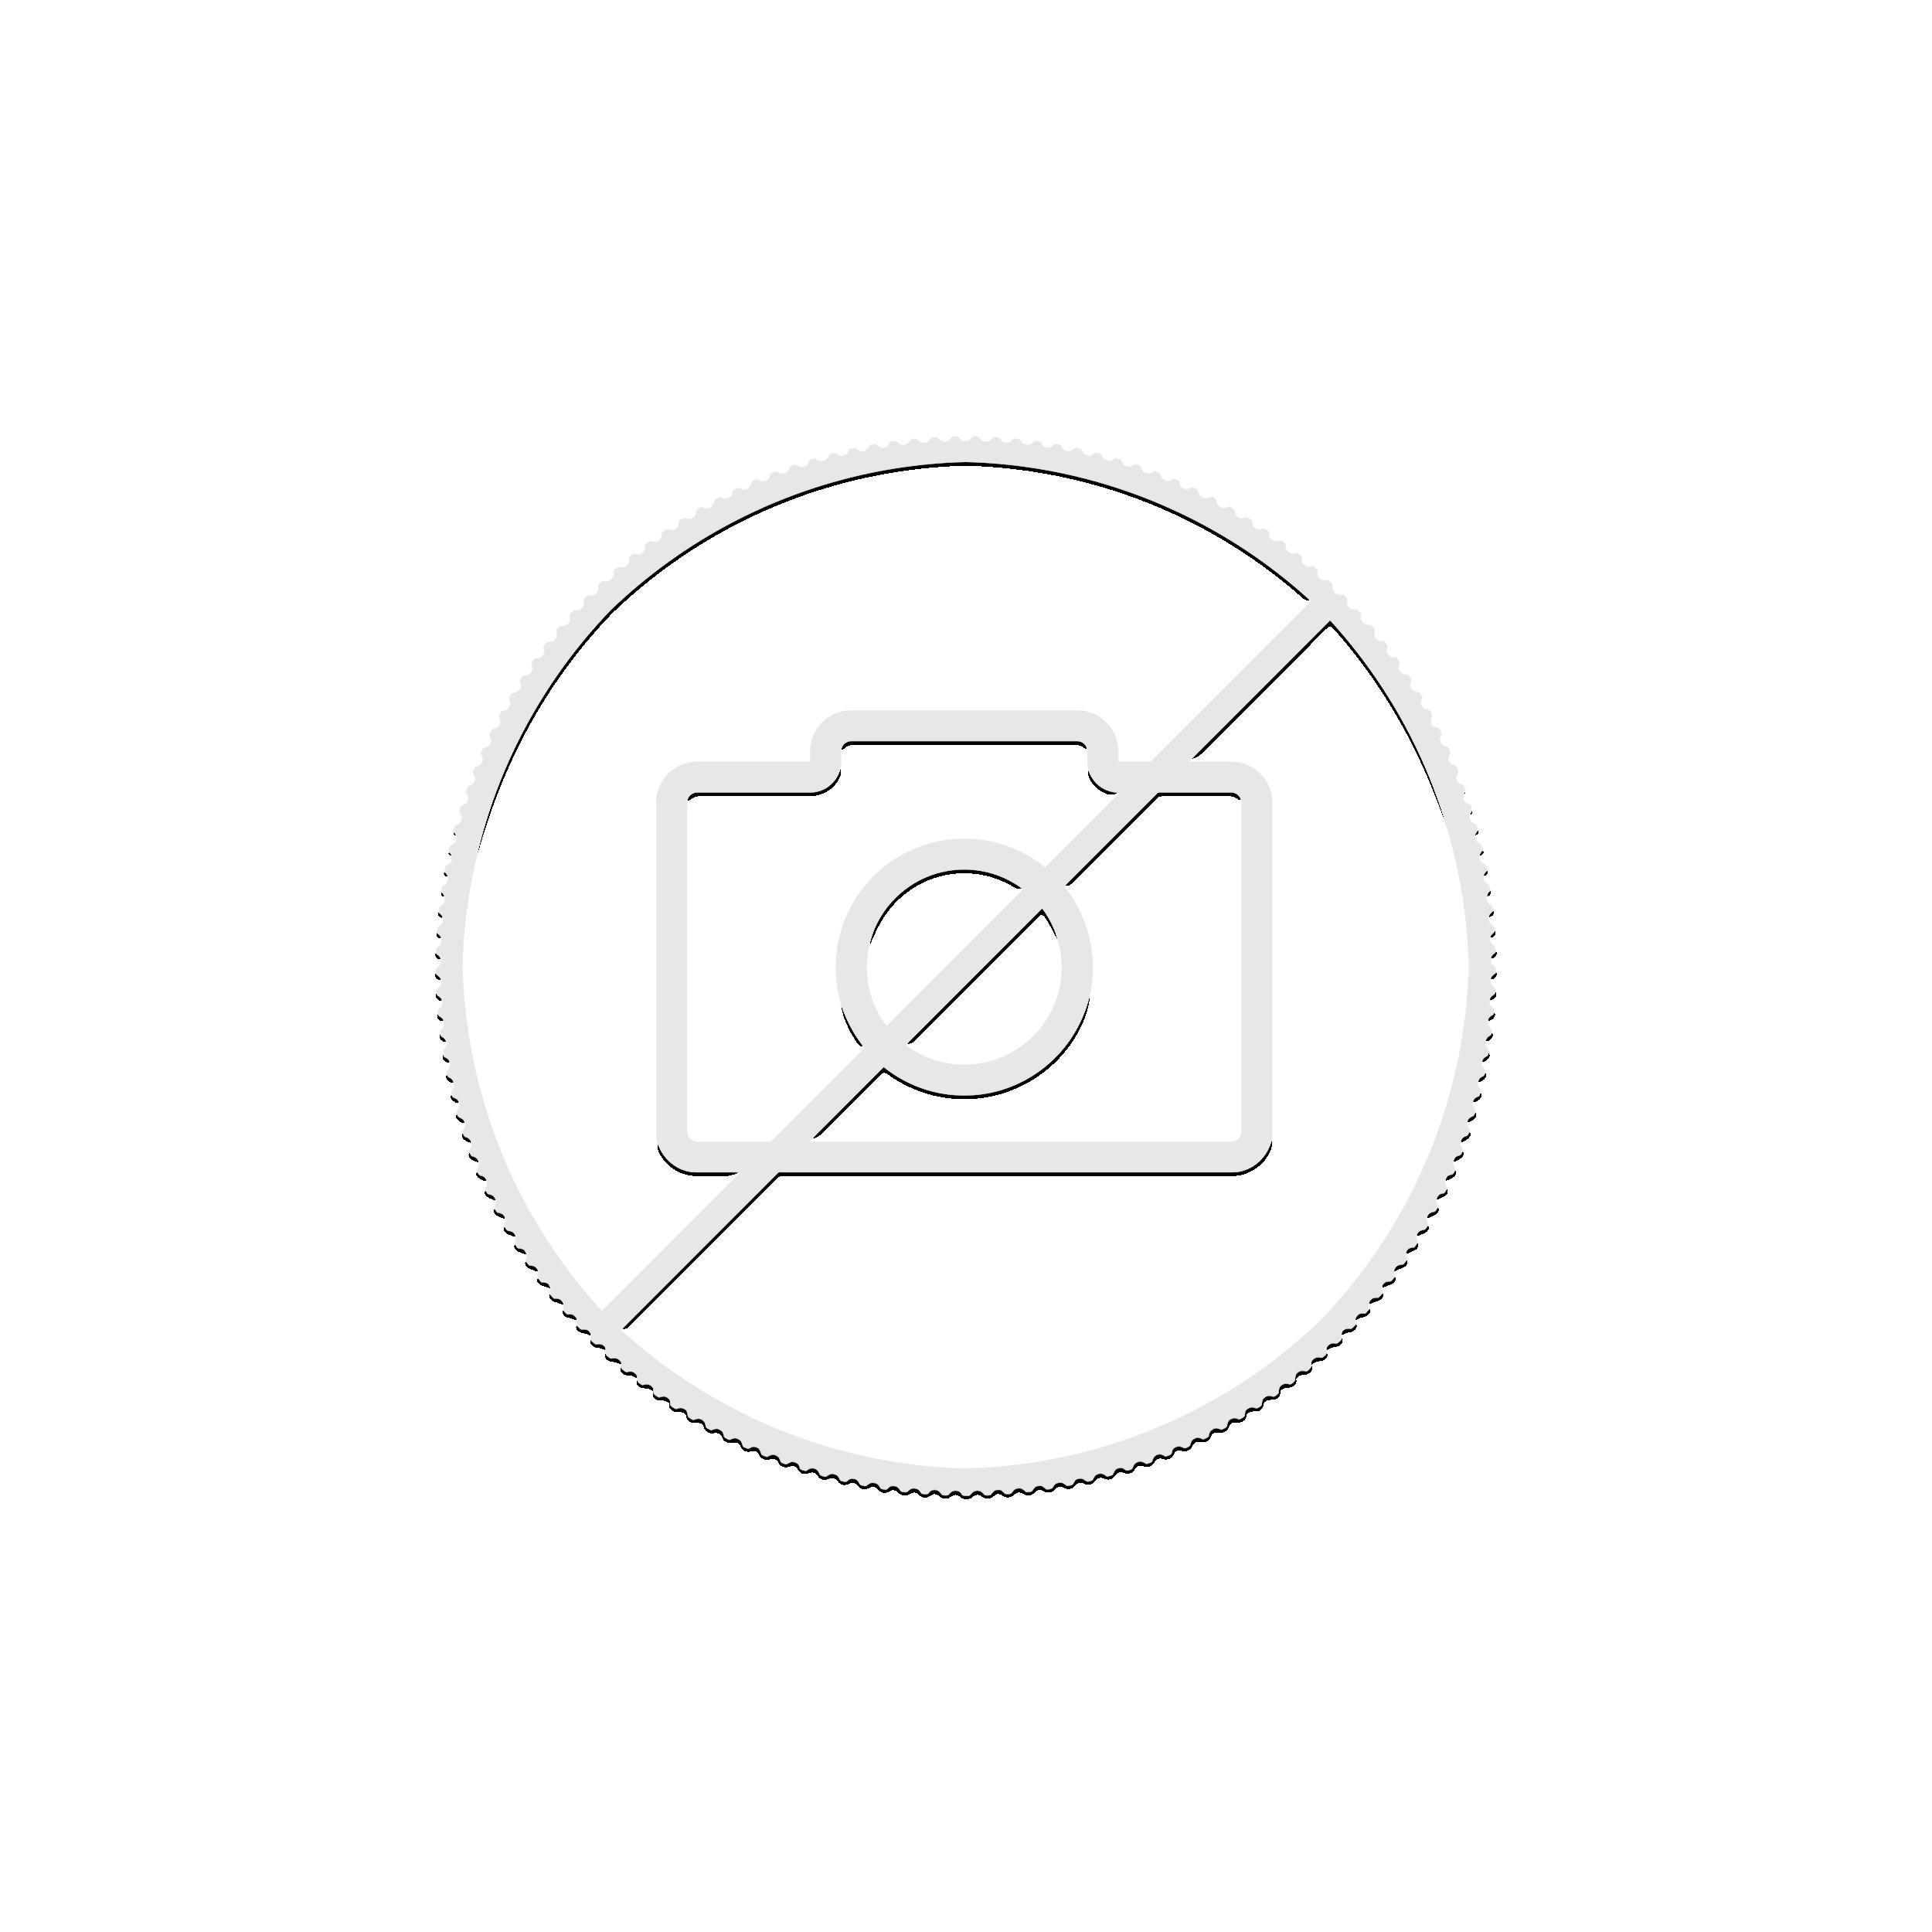 1 Troy ounce silver coin bar Rectagular Dragon 2018